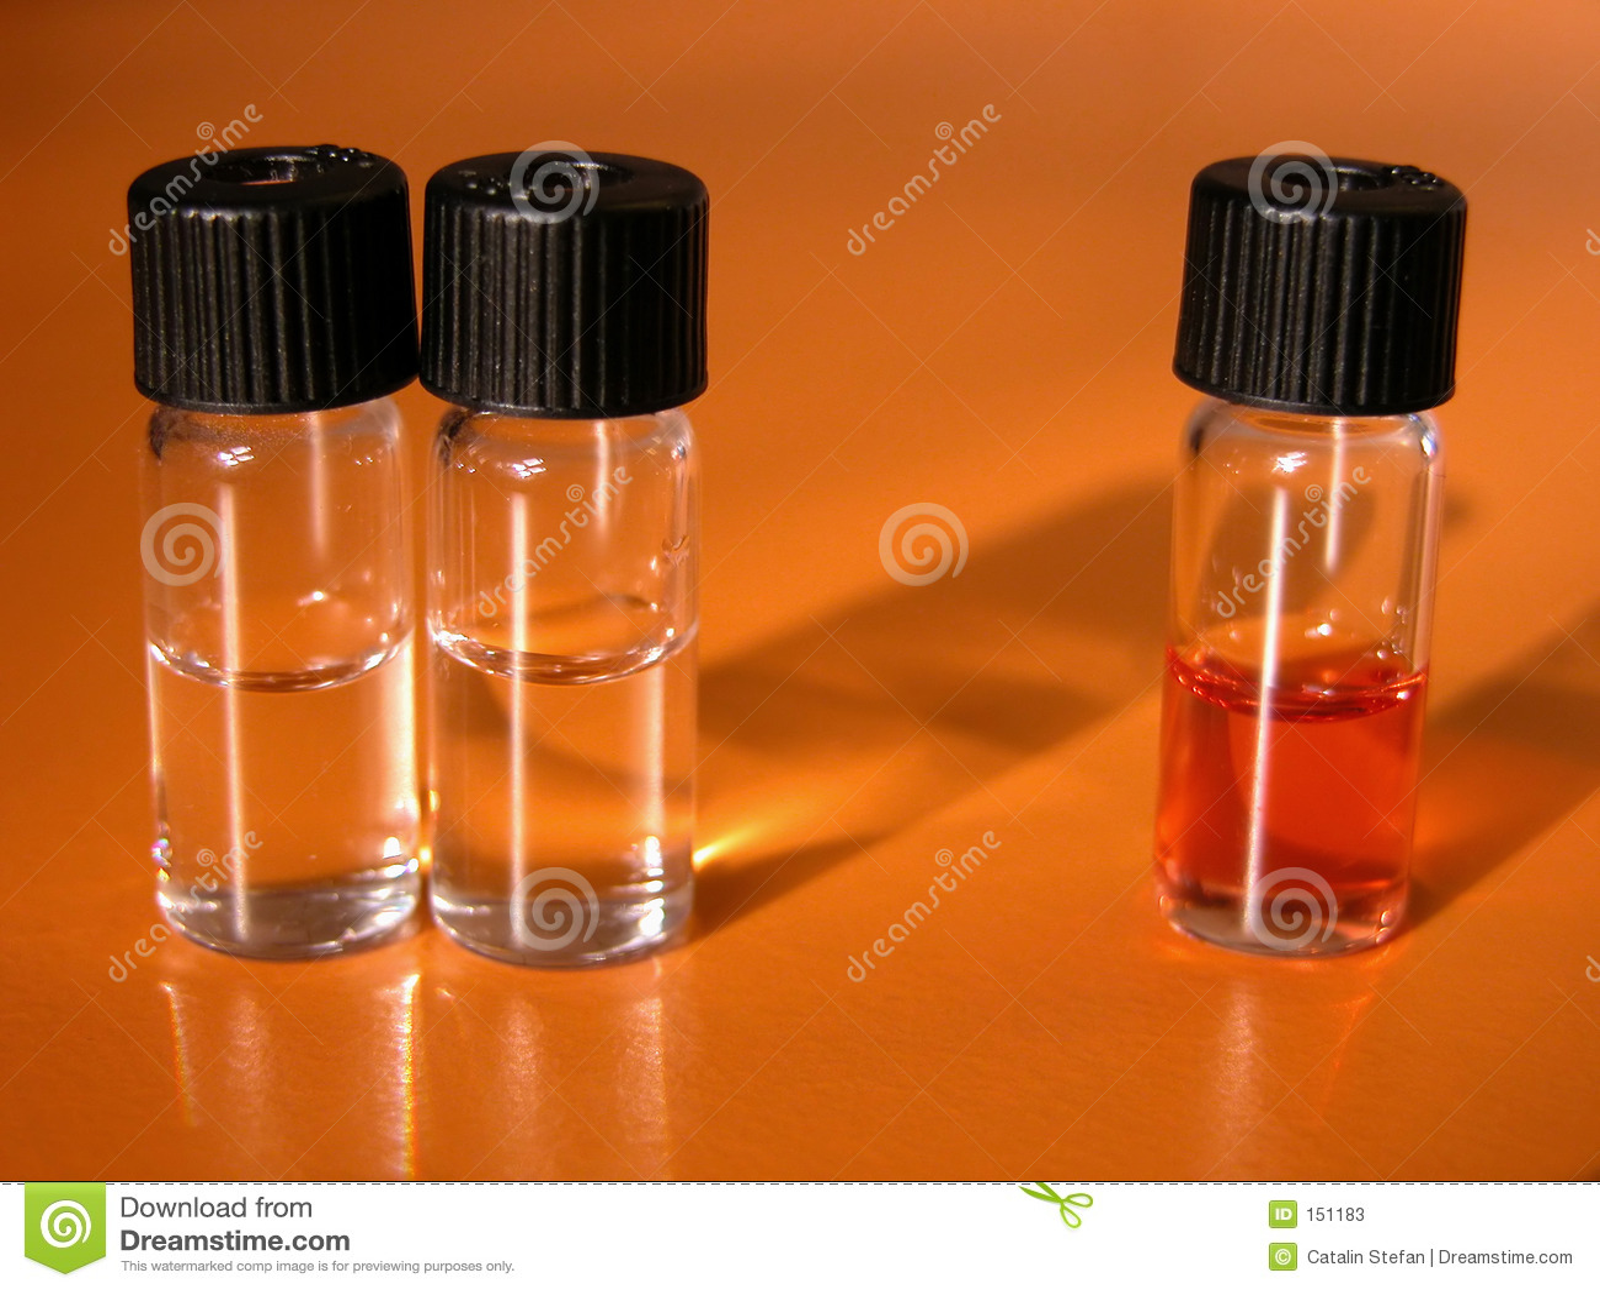 Science - Selectivity